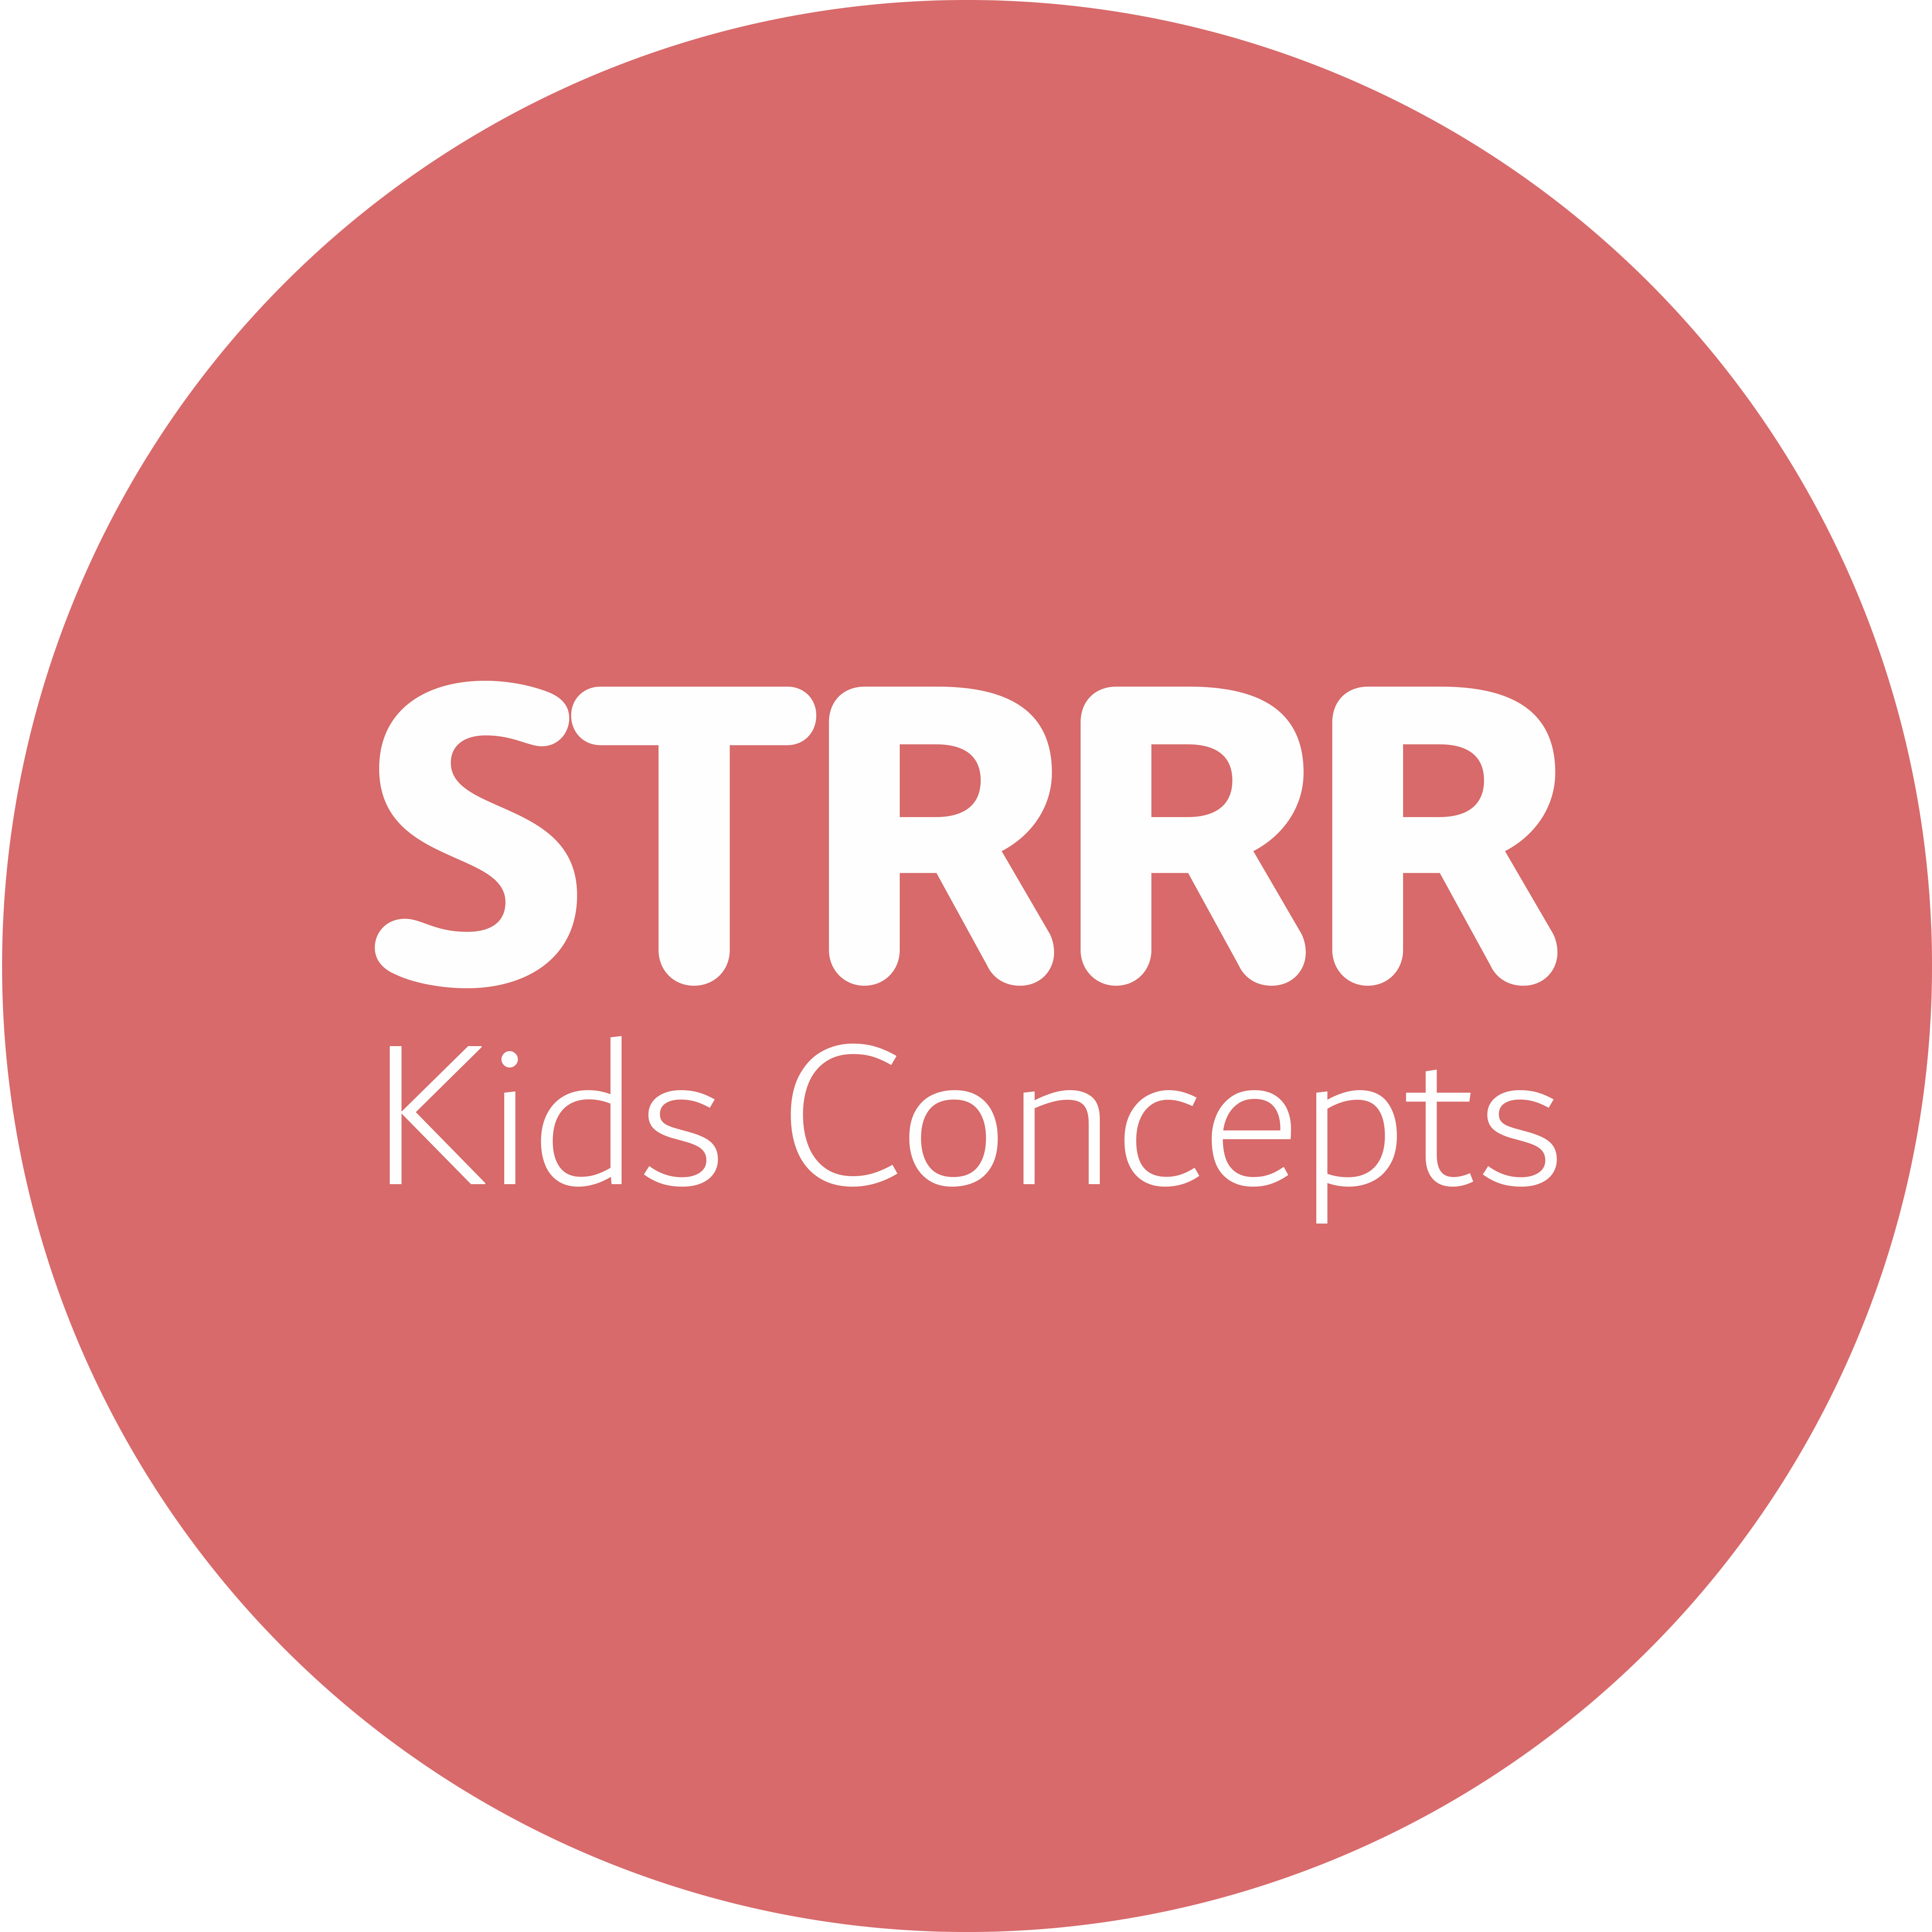 Stoerrr Kids Concepts